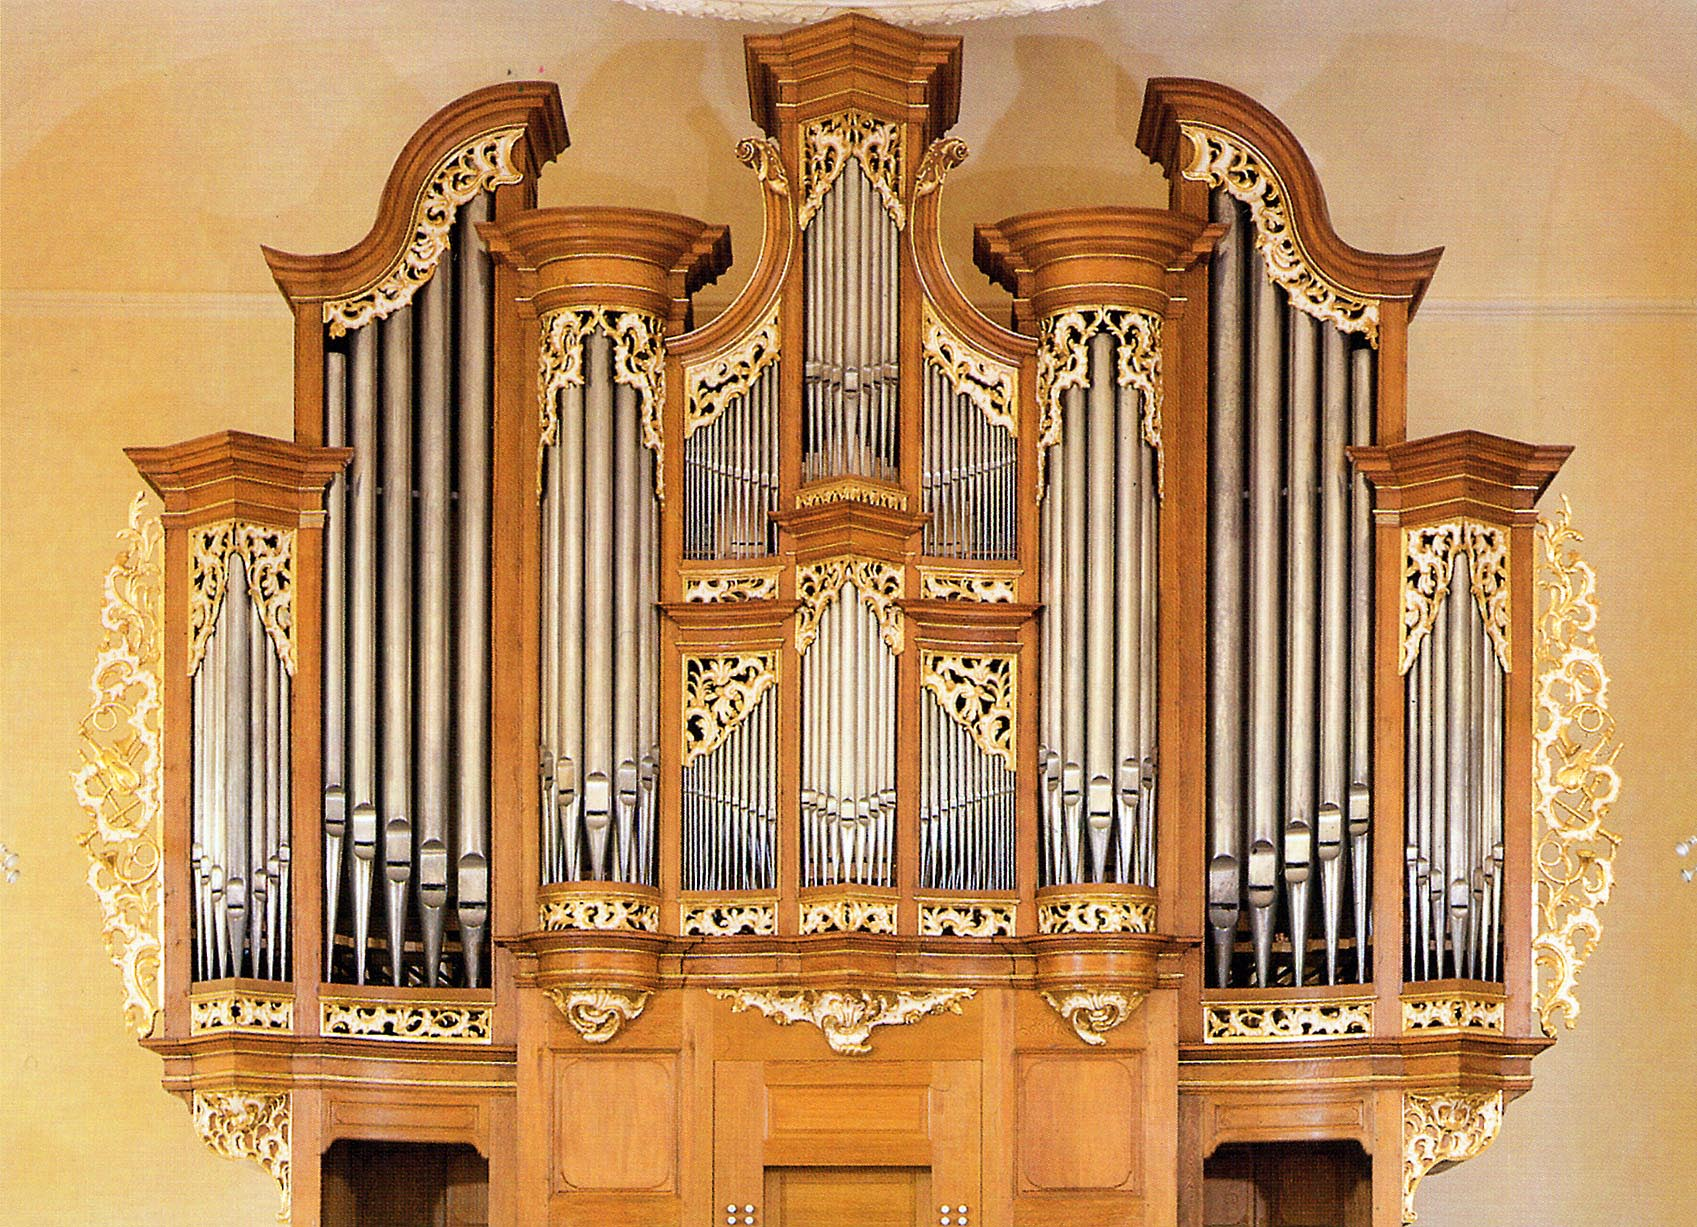 Miniorgelkoncert med julens orgelmusik